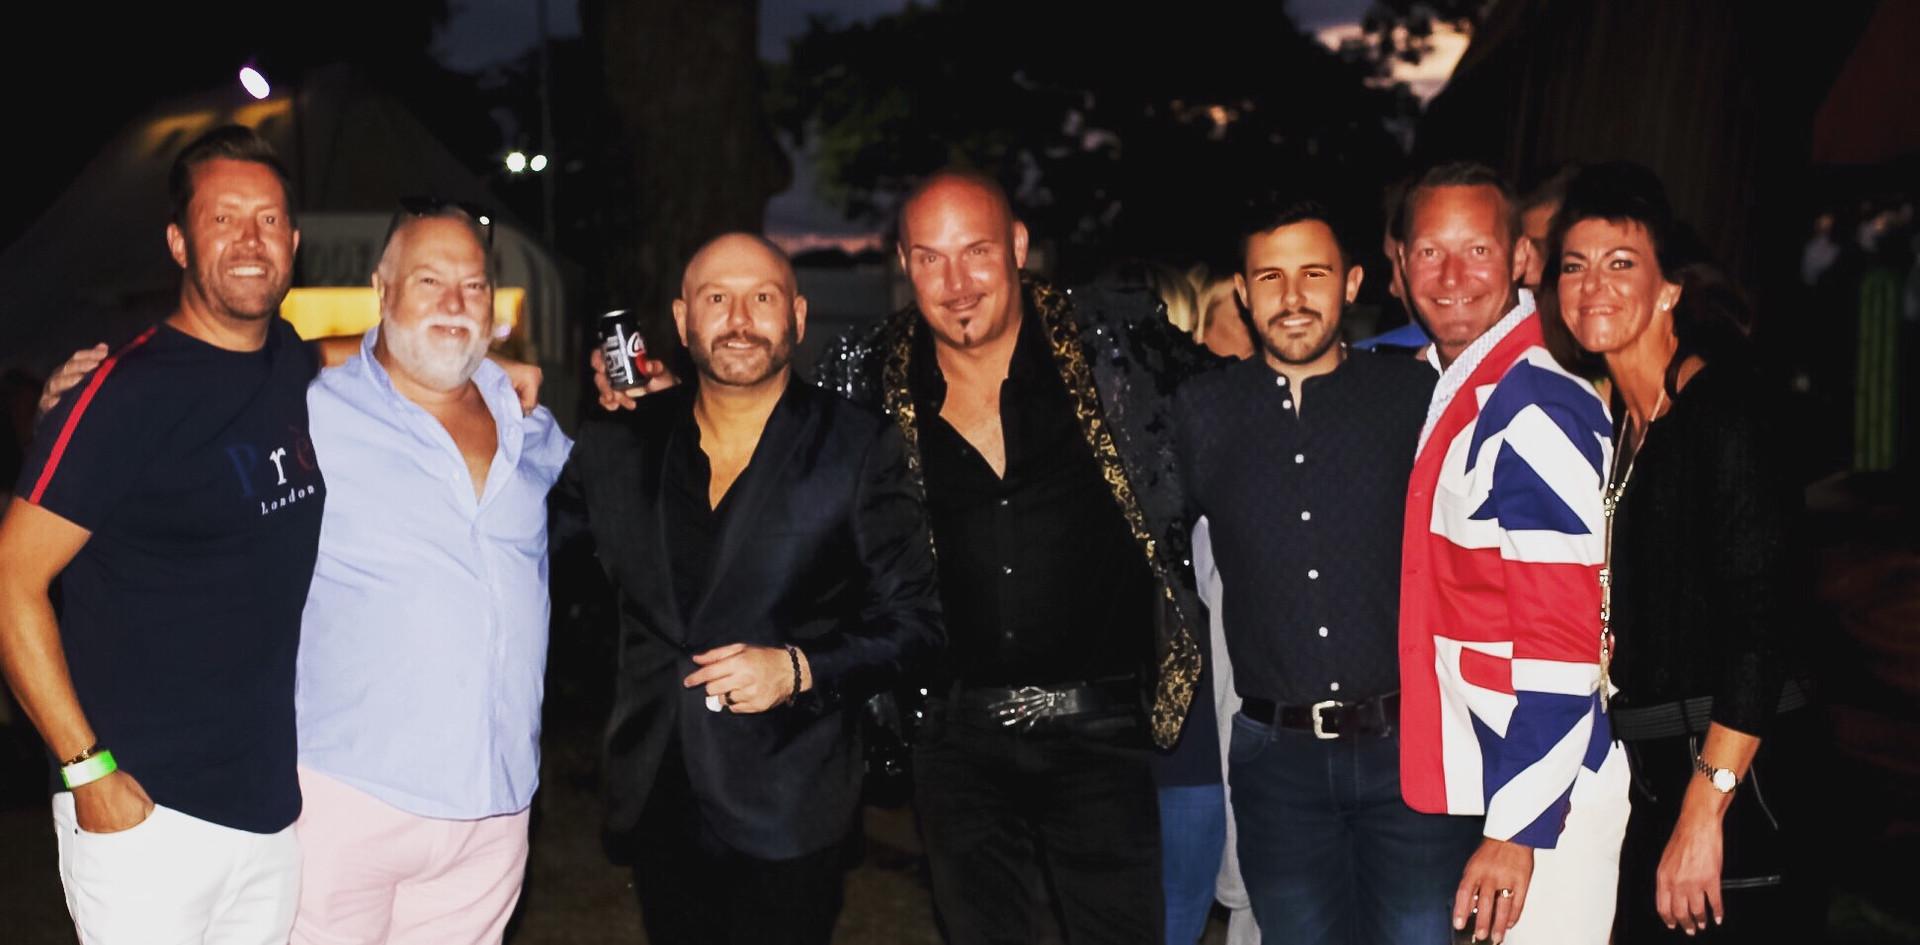 Craig Wilde with The Property Boyz, Filipe Neves Ribeiro and friends